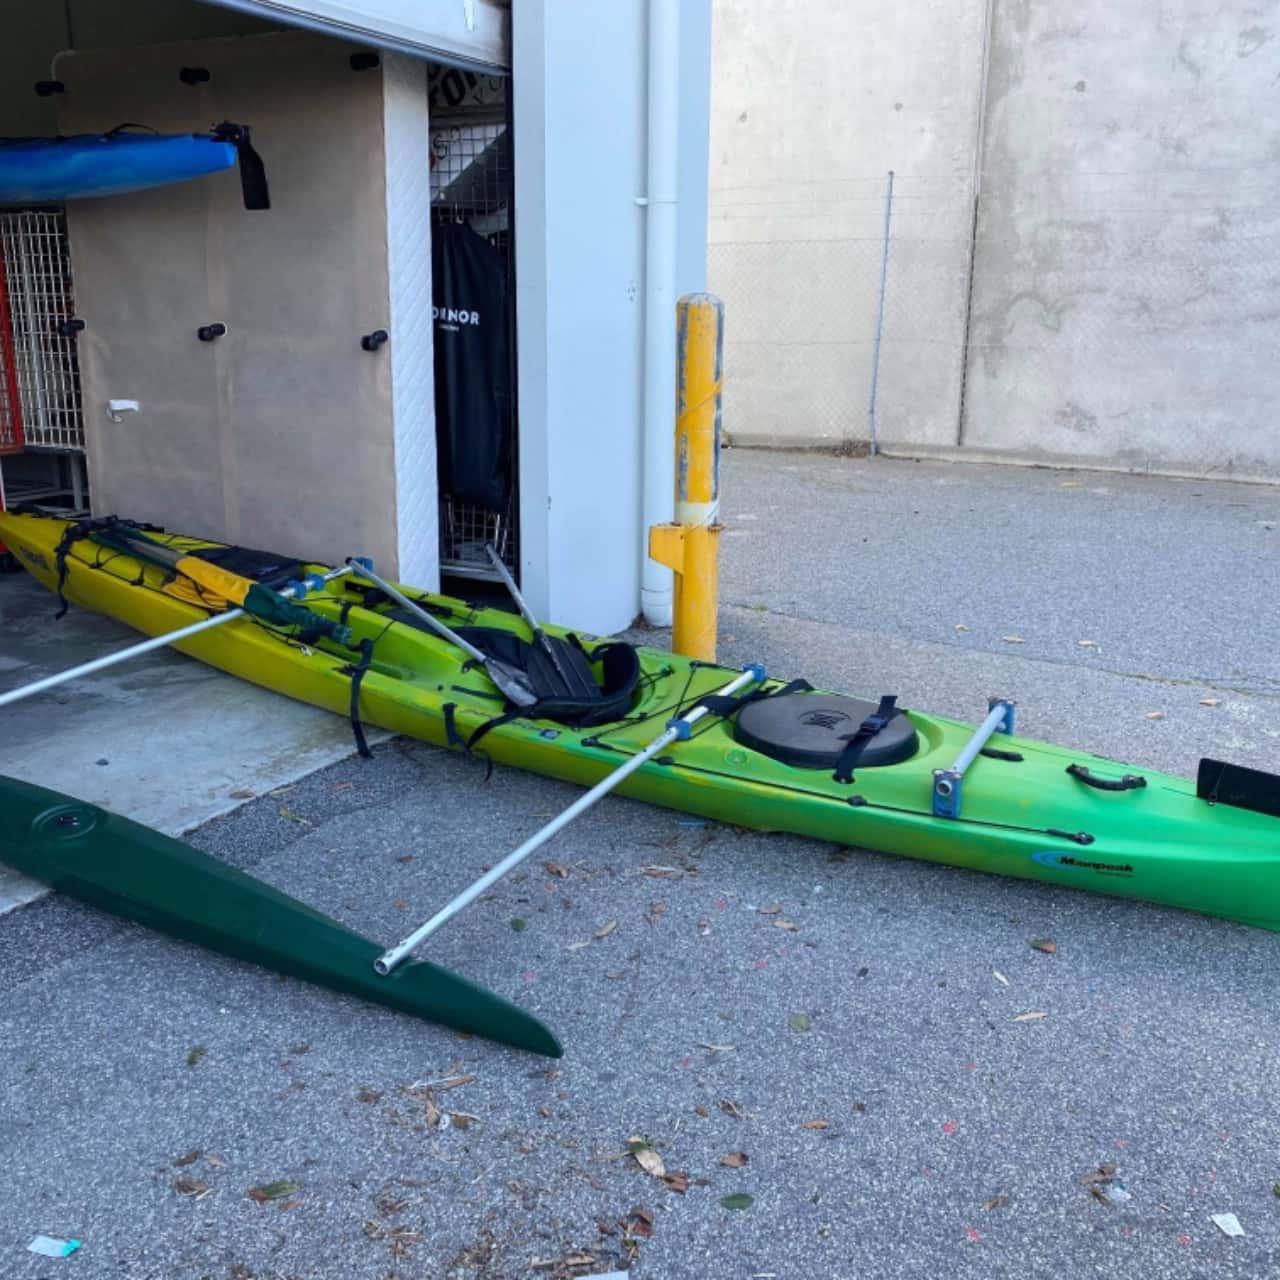 REDUCED Napali 470 Perception Kayak Green/Yellow